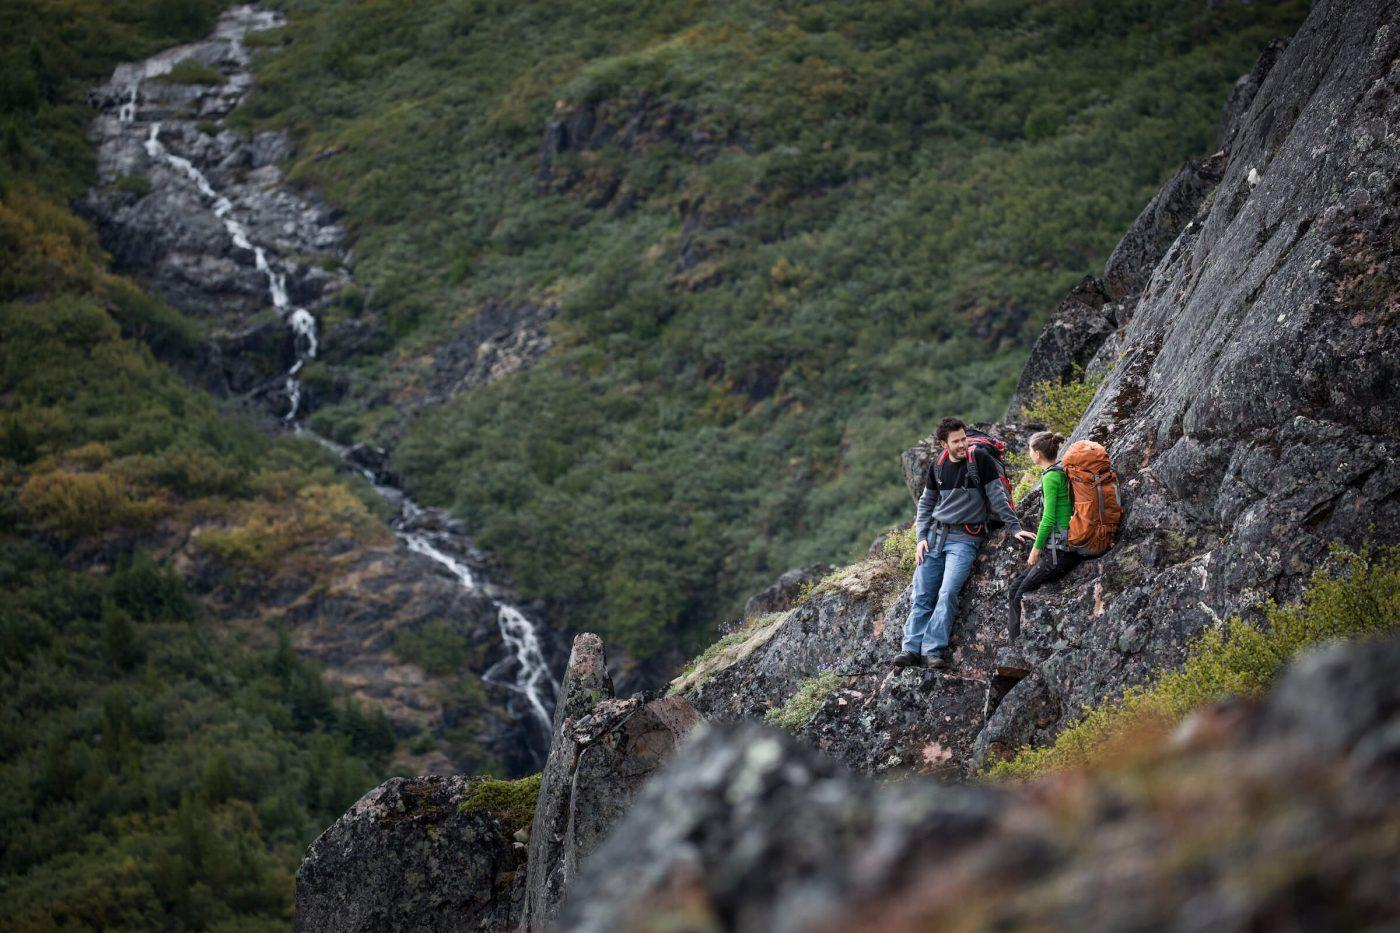 Hikers near a waterfall in Narsarsuaq. By Mads Pihl